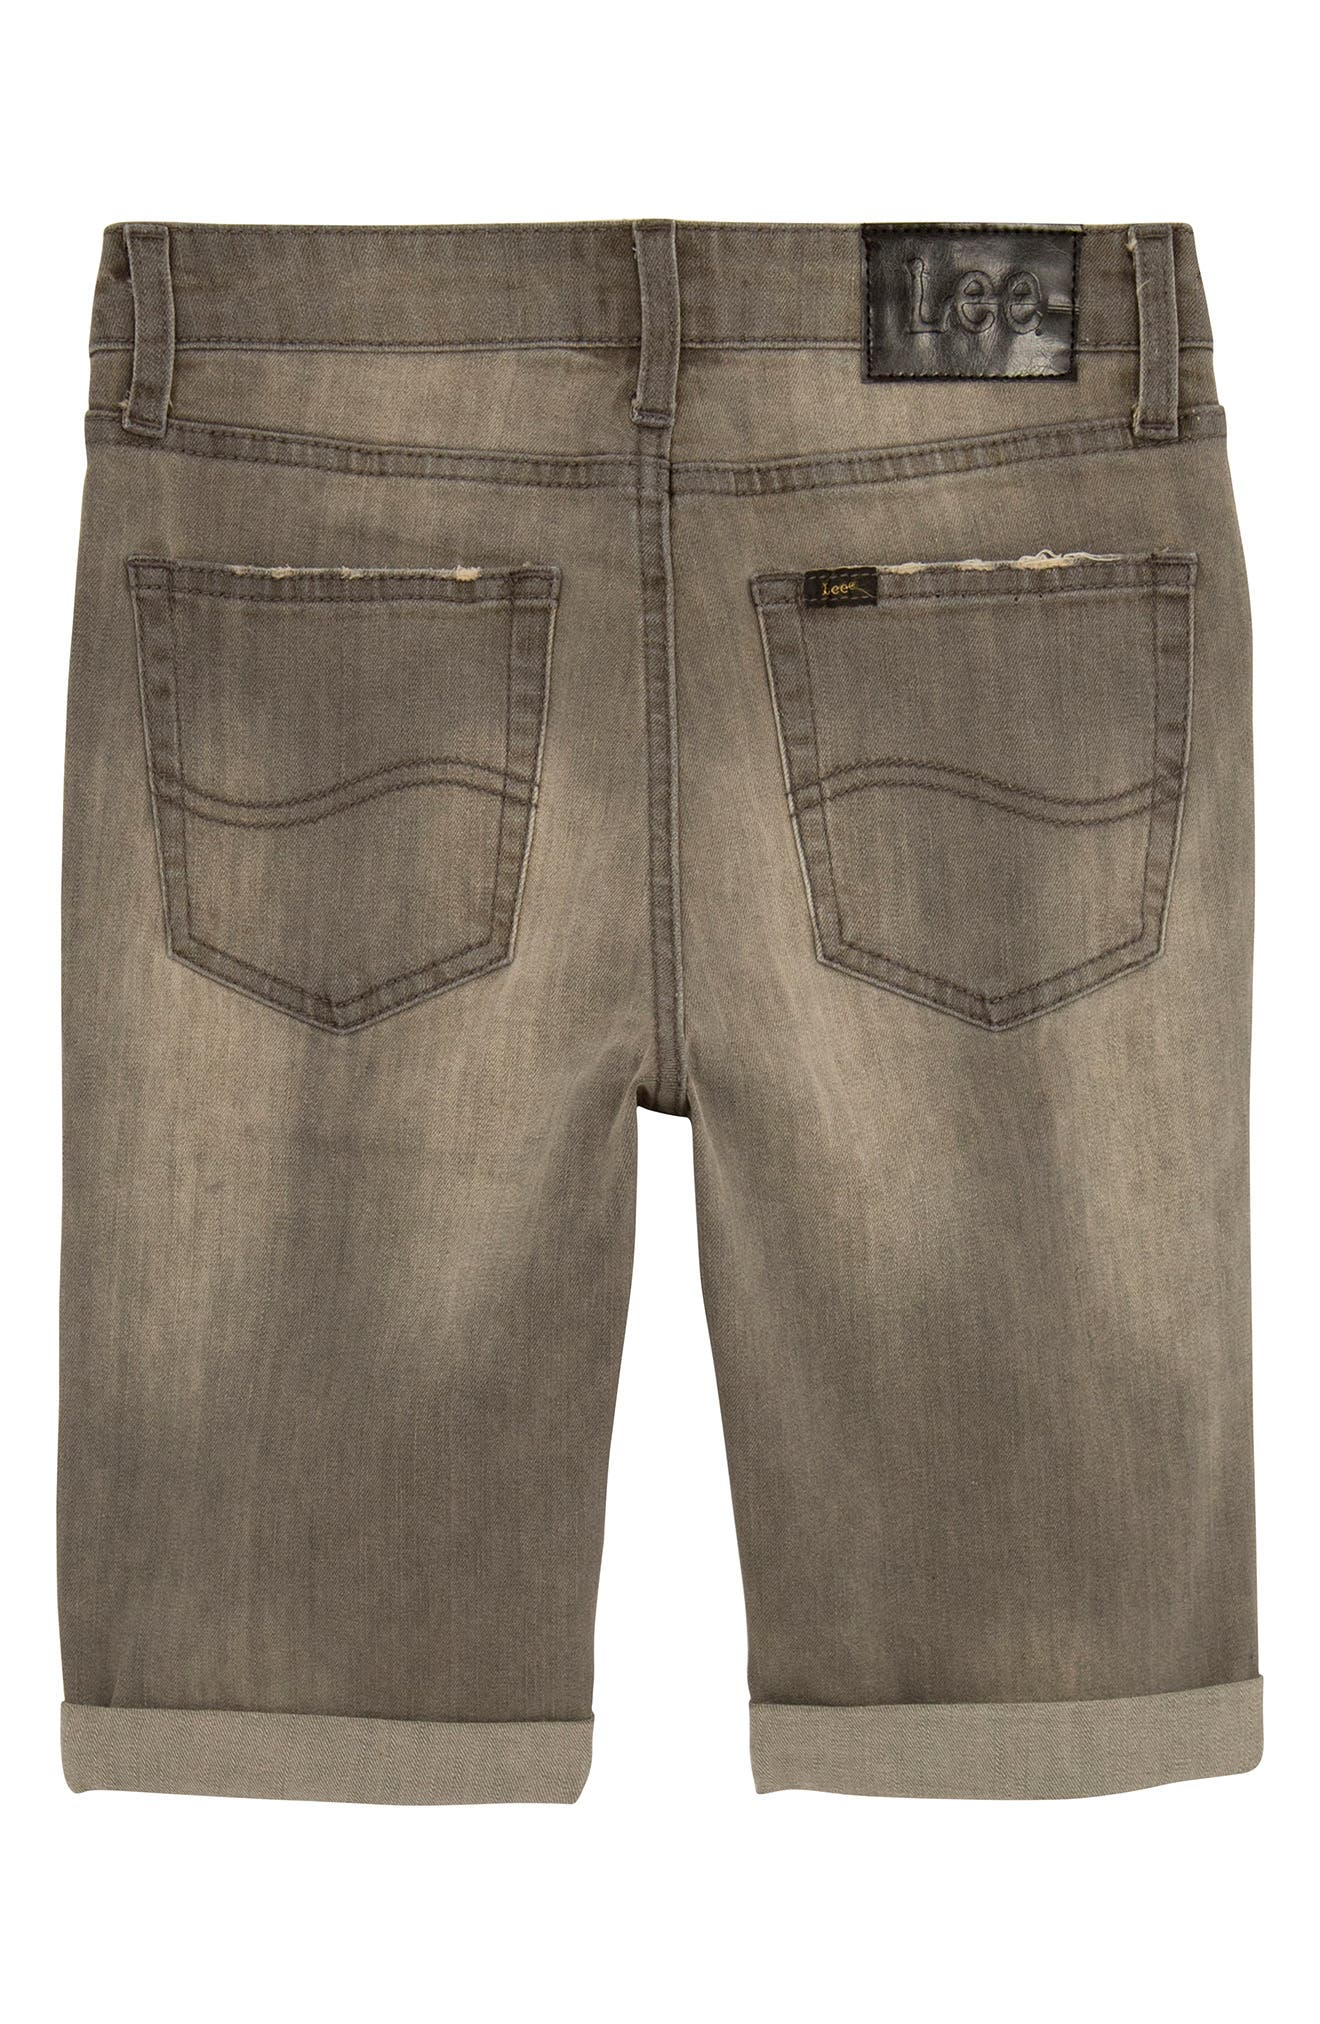 Alternate Image 2  - Lee Straight Leg Cuffed Denim Shorts (Big Boys)